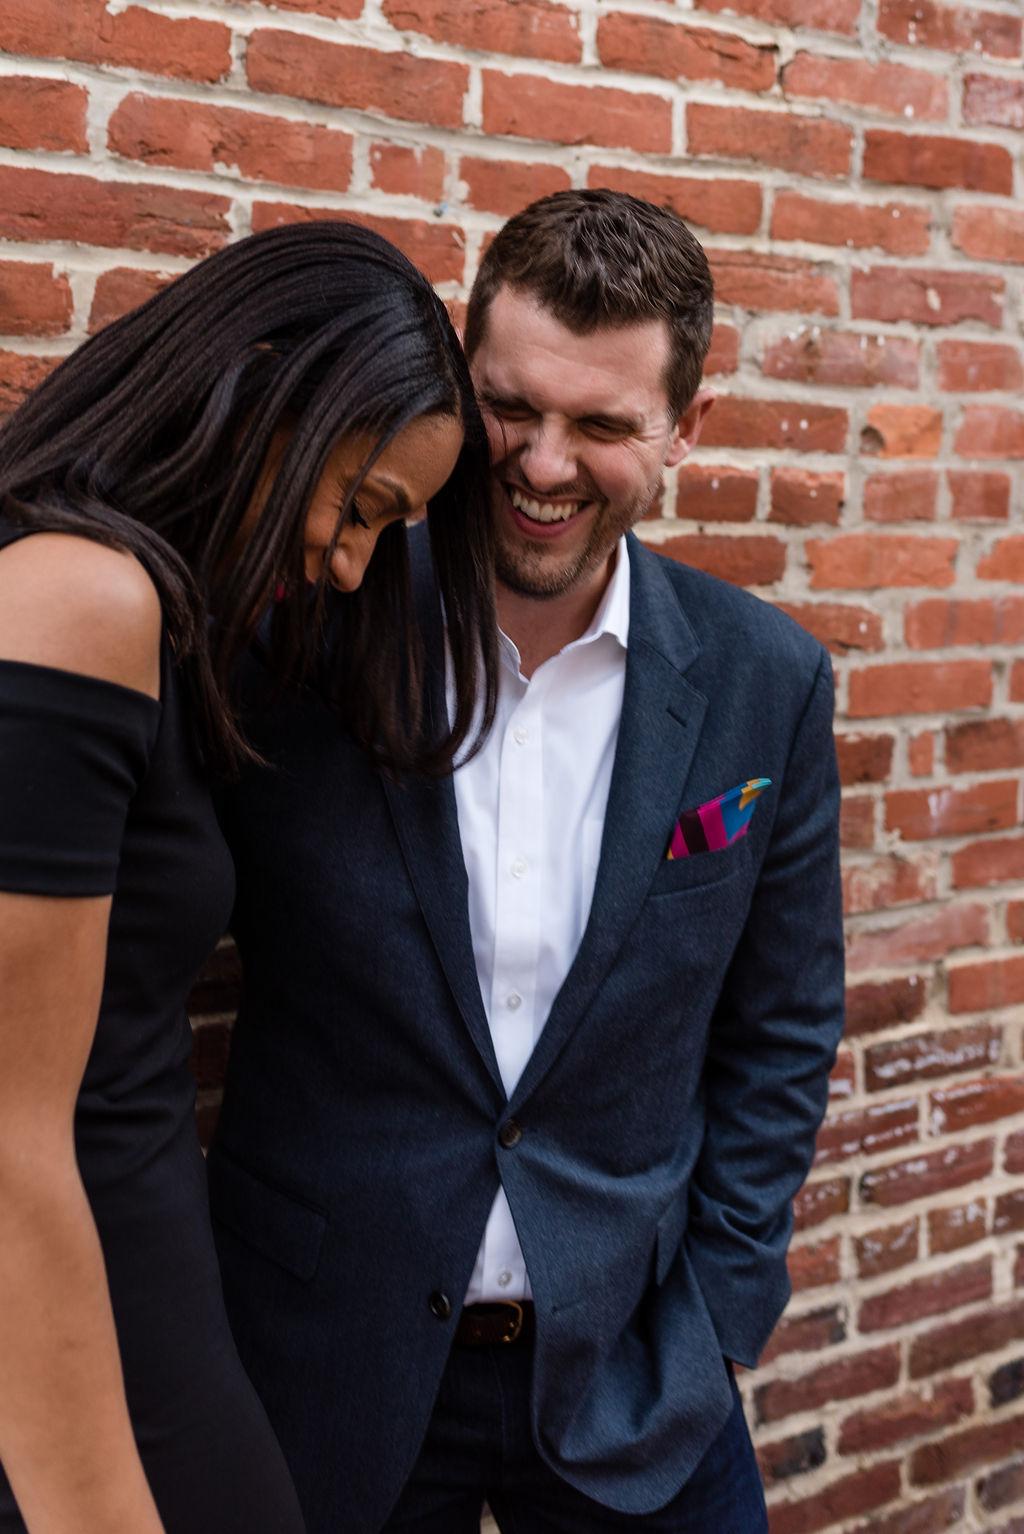 Erin-Fabio-Photography-Jen-and-Tony-Engagement-Oct-2018-71.jpg